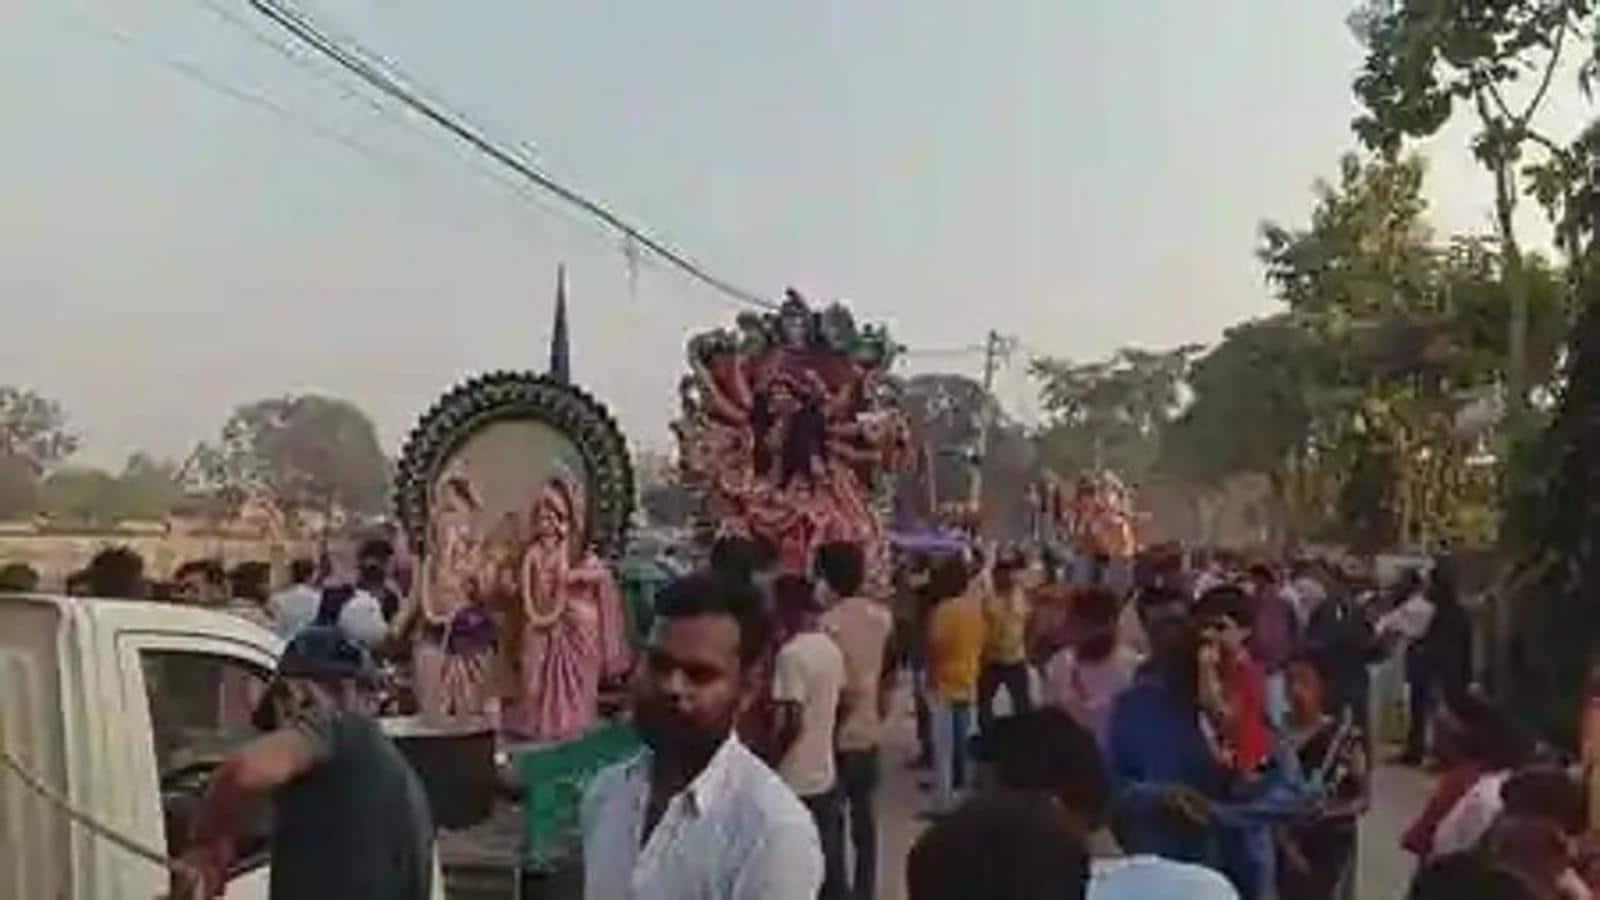 Uttar Pradesh: Four die in Durga idol immersion mishaps in Pratapgarh, Prayagraj